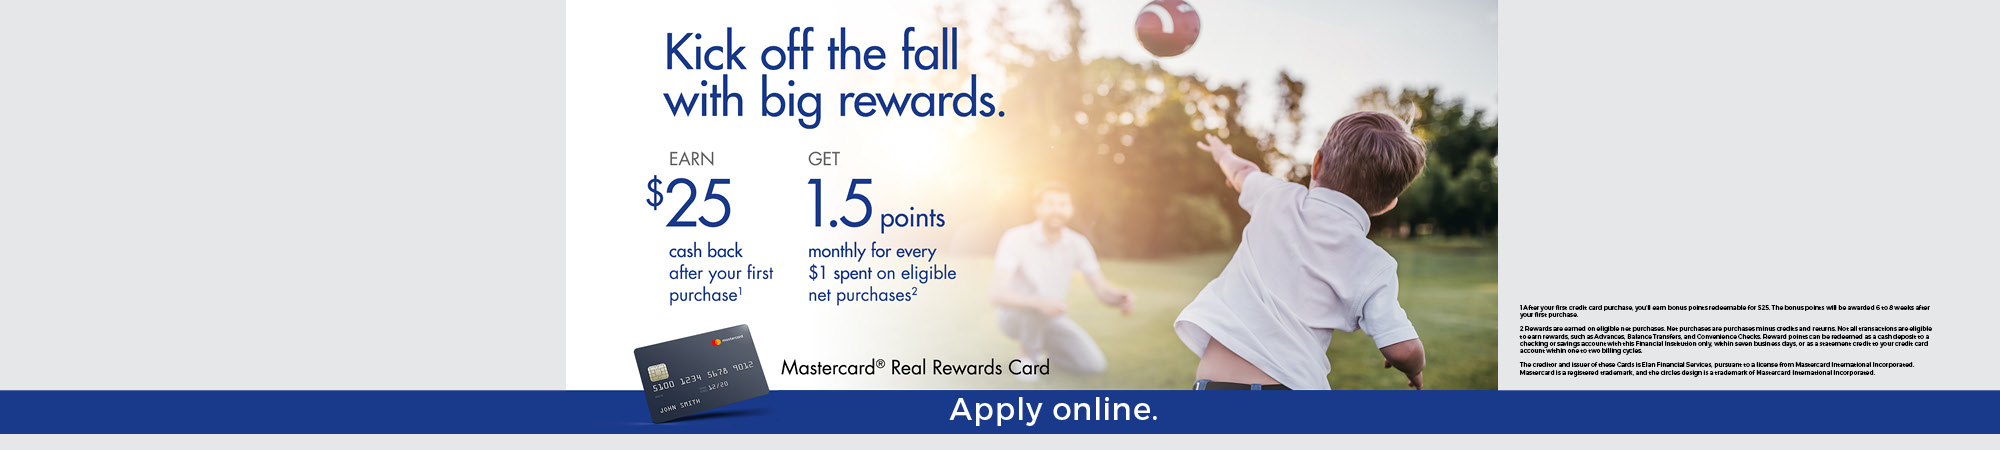 4th Qtr Credit Card Promo